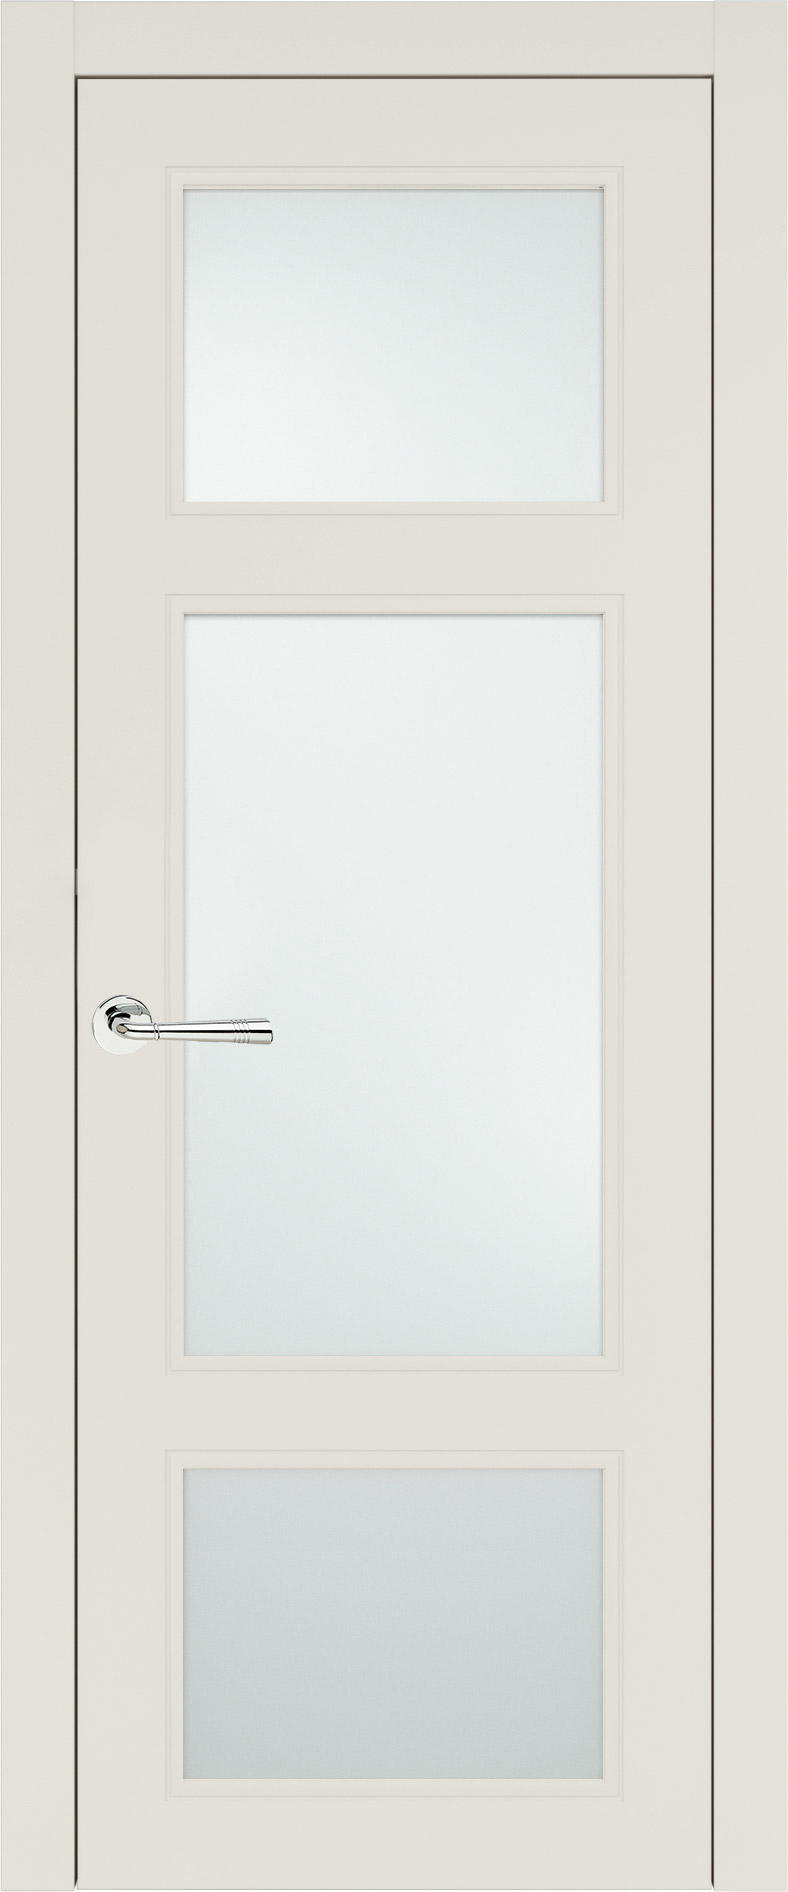 Siena Neo Classic цвет - Бежевая эмаль (RAL 9010) Со стеклом (ДО)